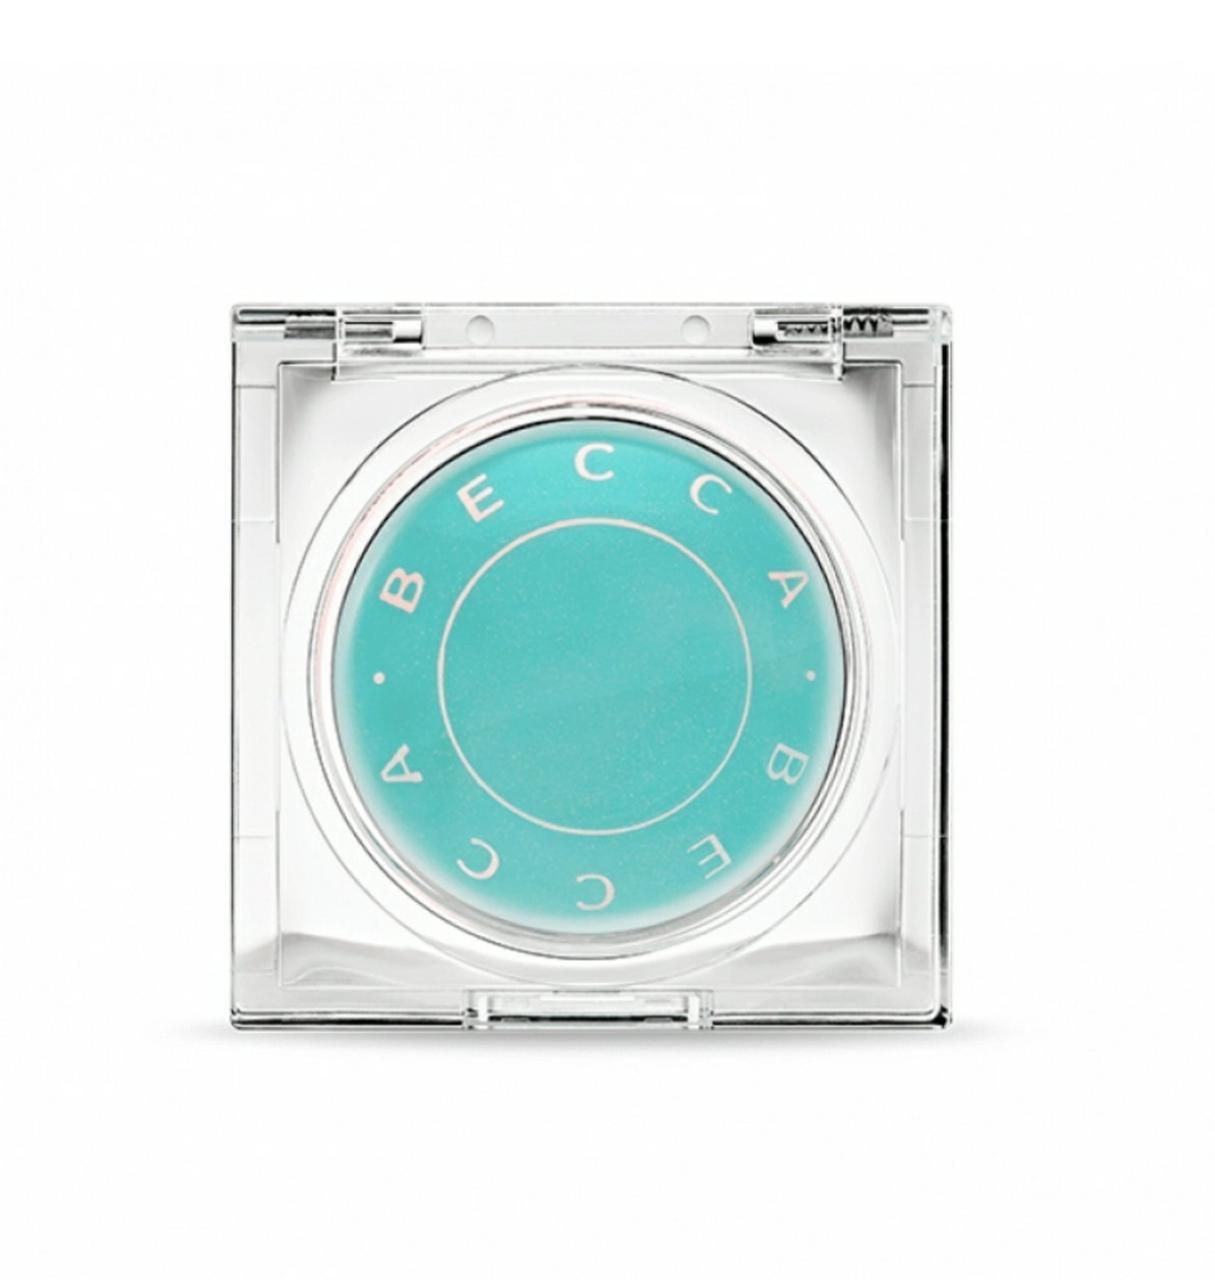 Праймер под глаза BECCA Cosmetics Anti-Fatigue Under Eye Primer ( без коробки)